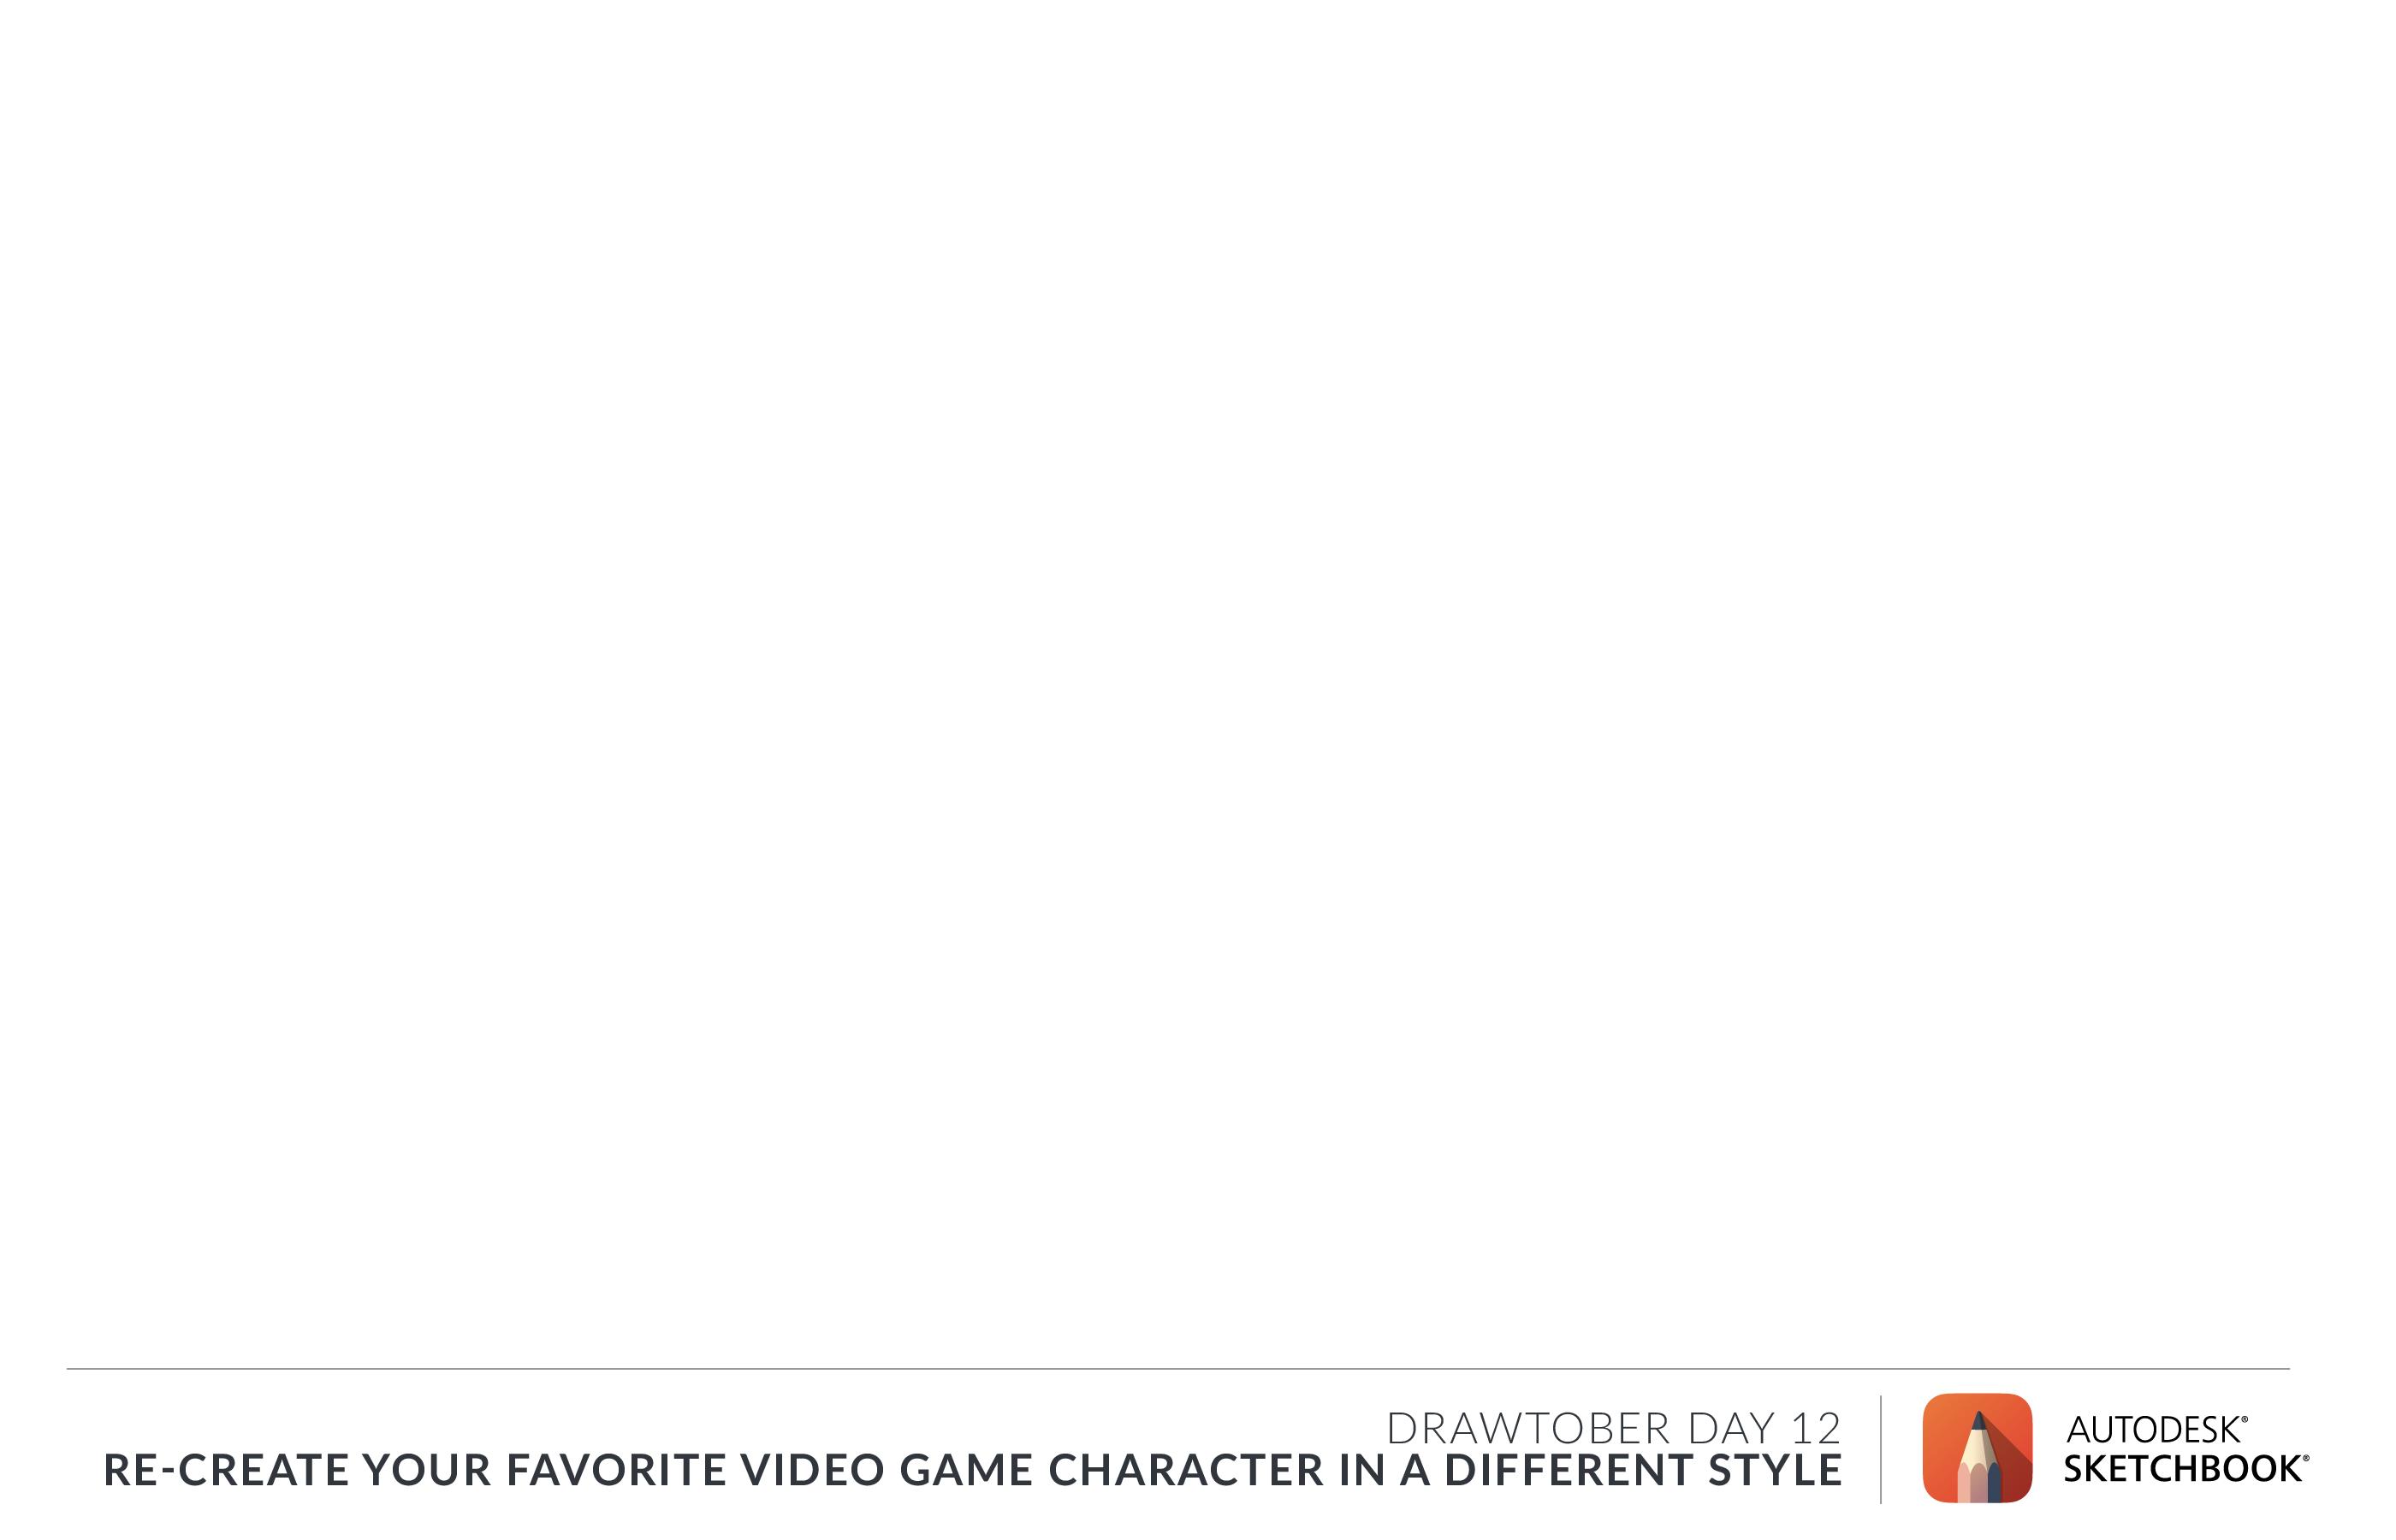 Drawtober Day 12 - Monday Media: Video Game Styles